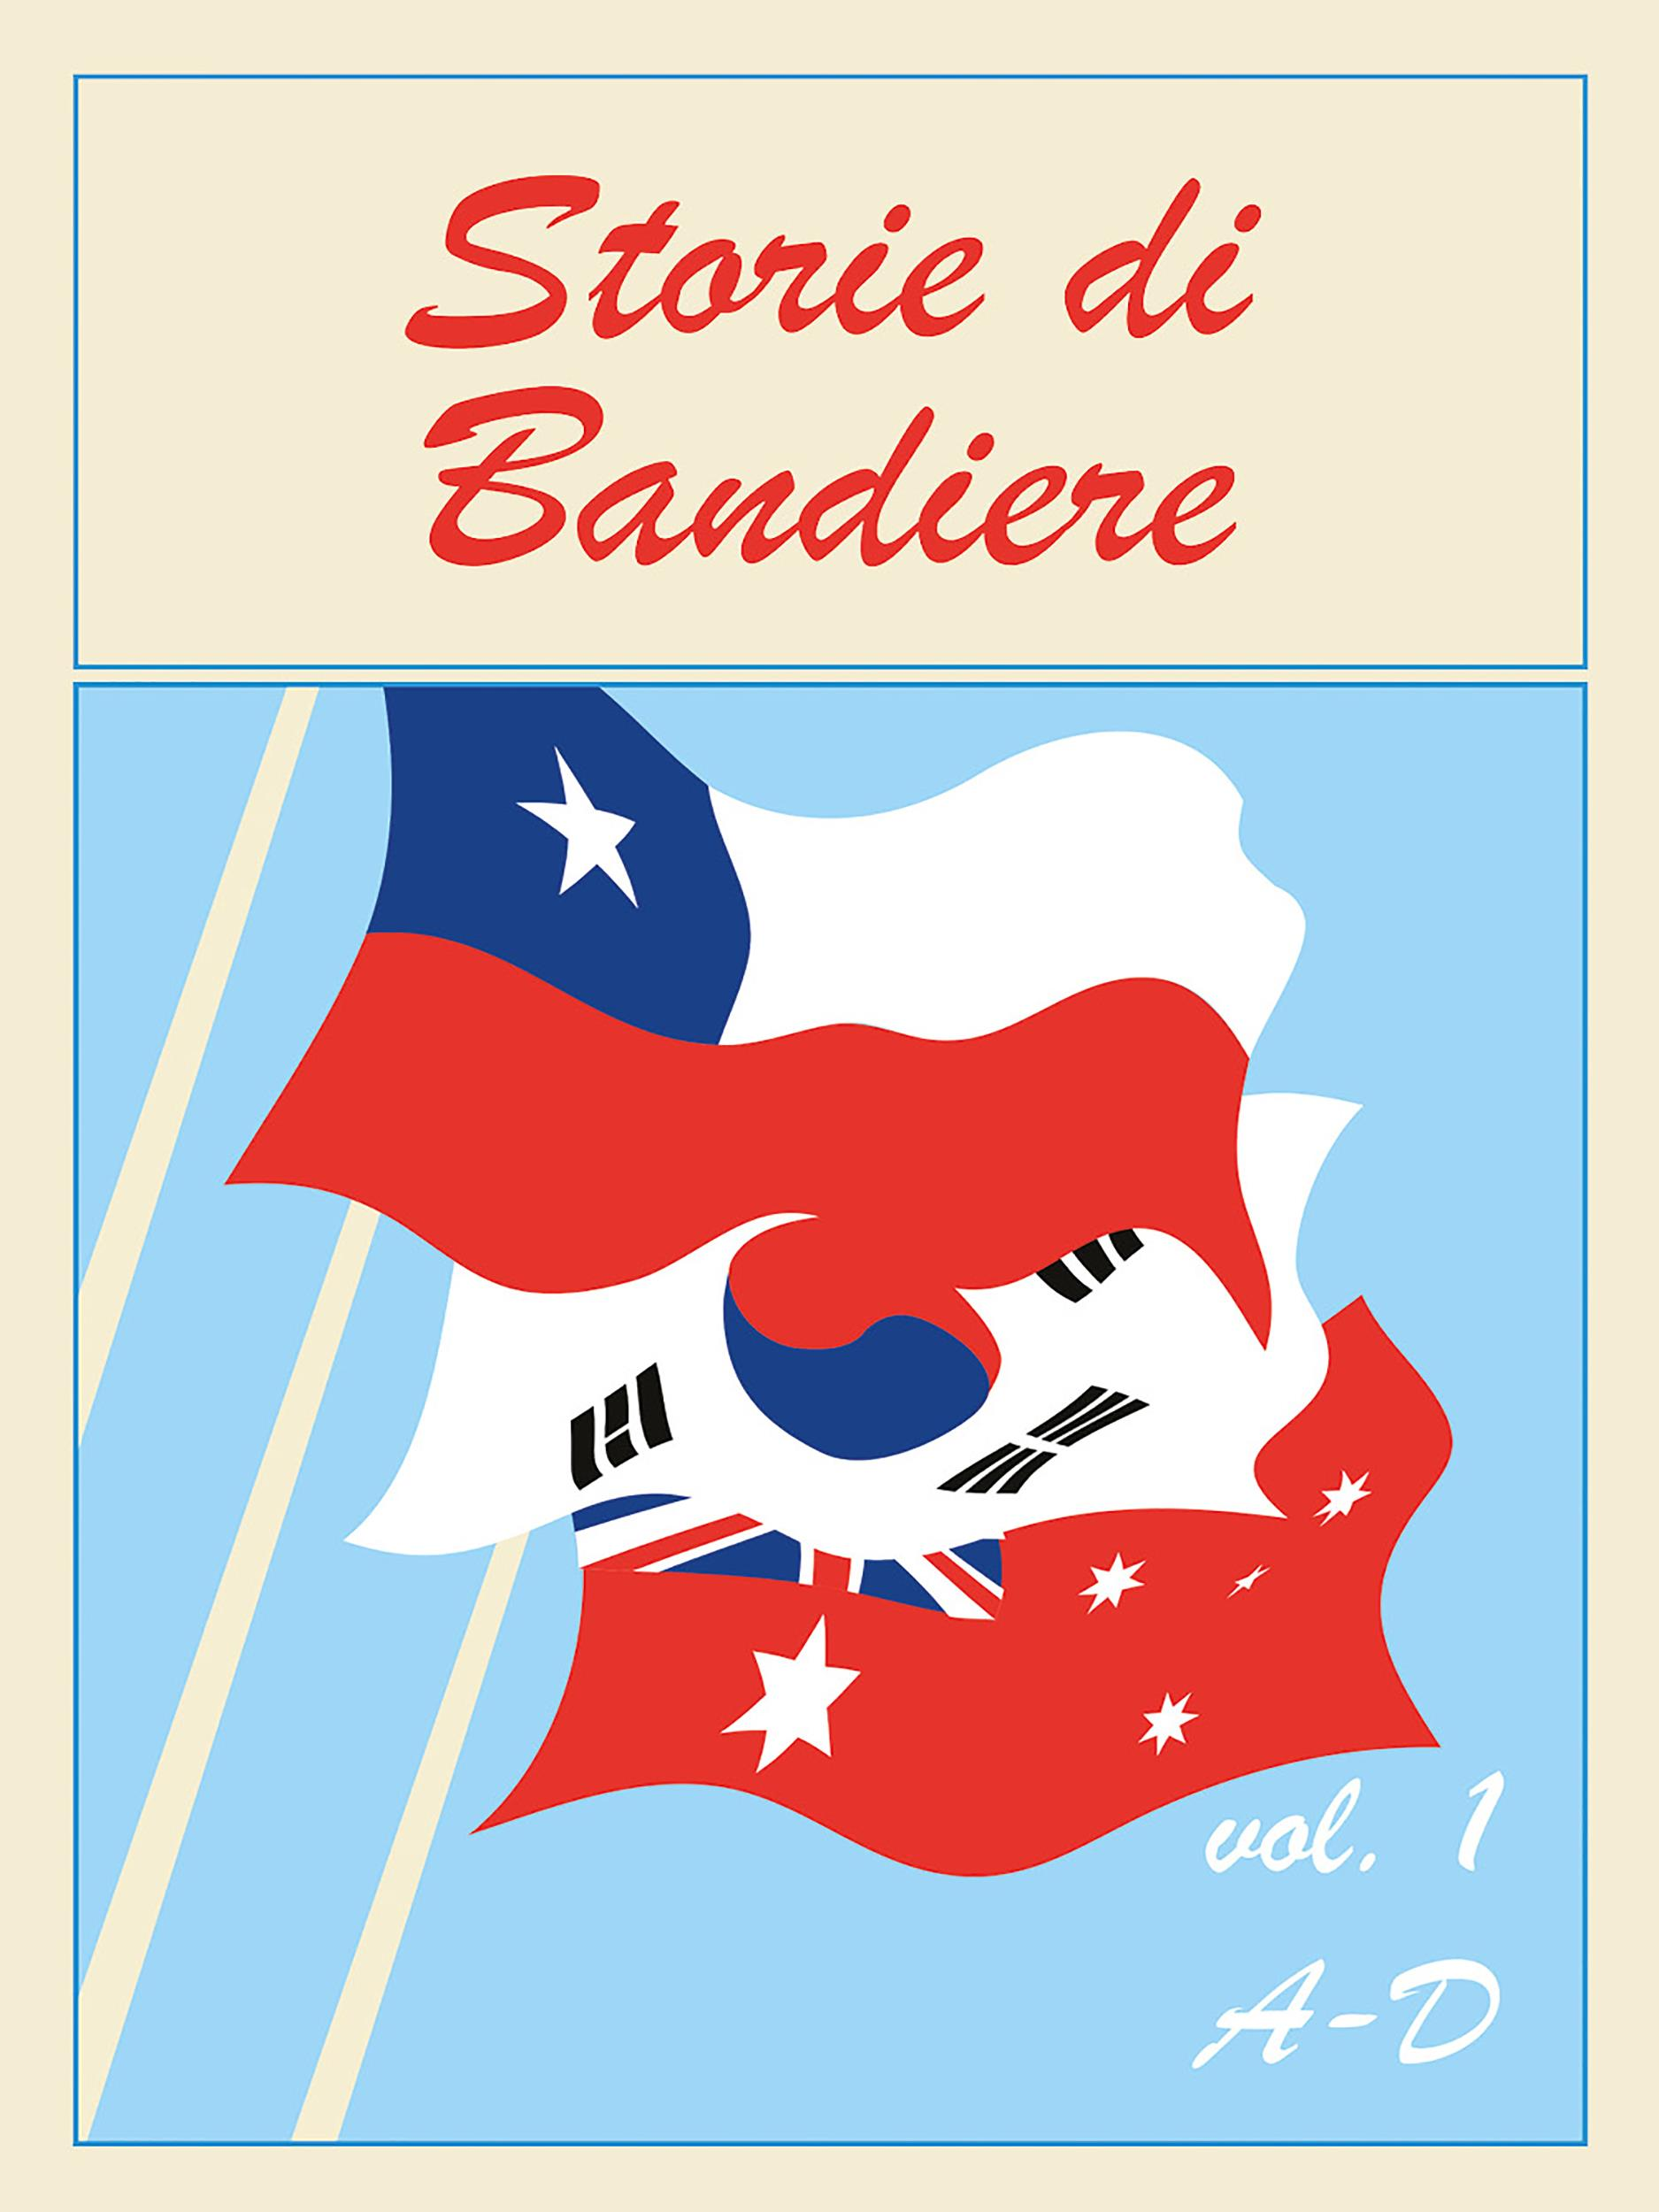 Storie di Bandiere vol. 1 A-D